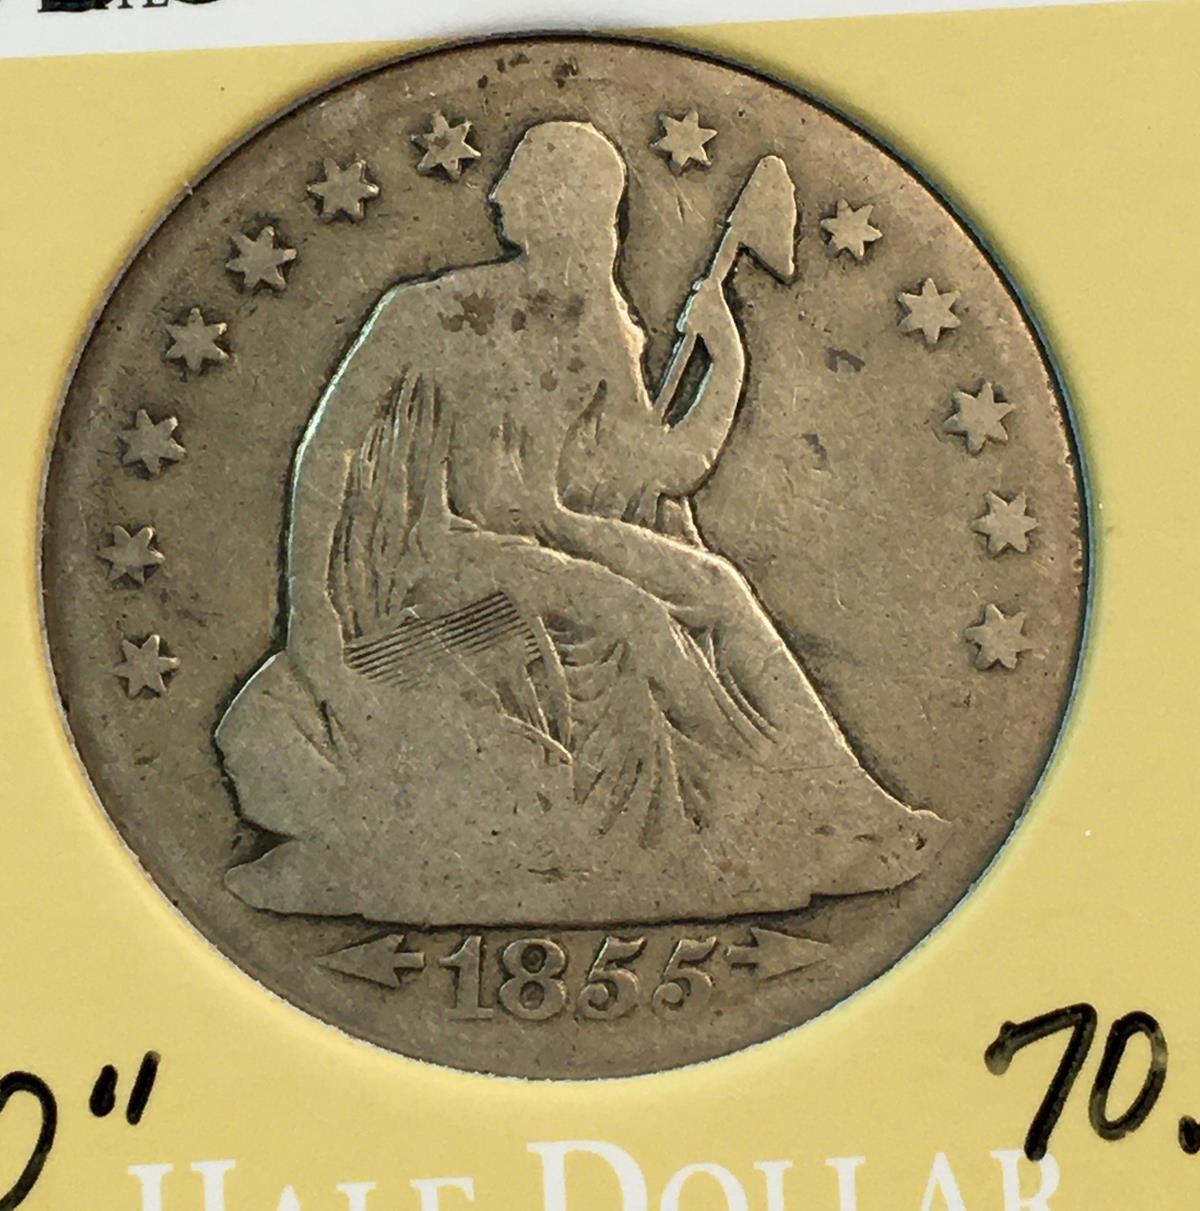 1855-O US 50c Seated Liberty Silver Half Dollar w/ Arrows